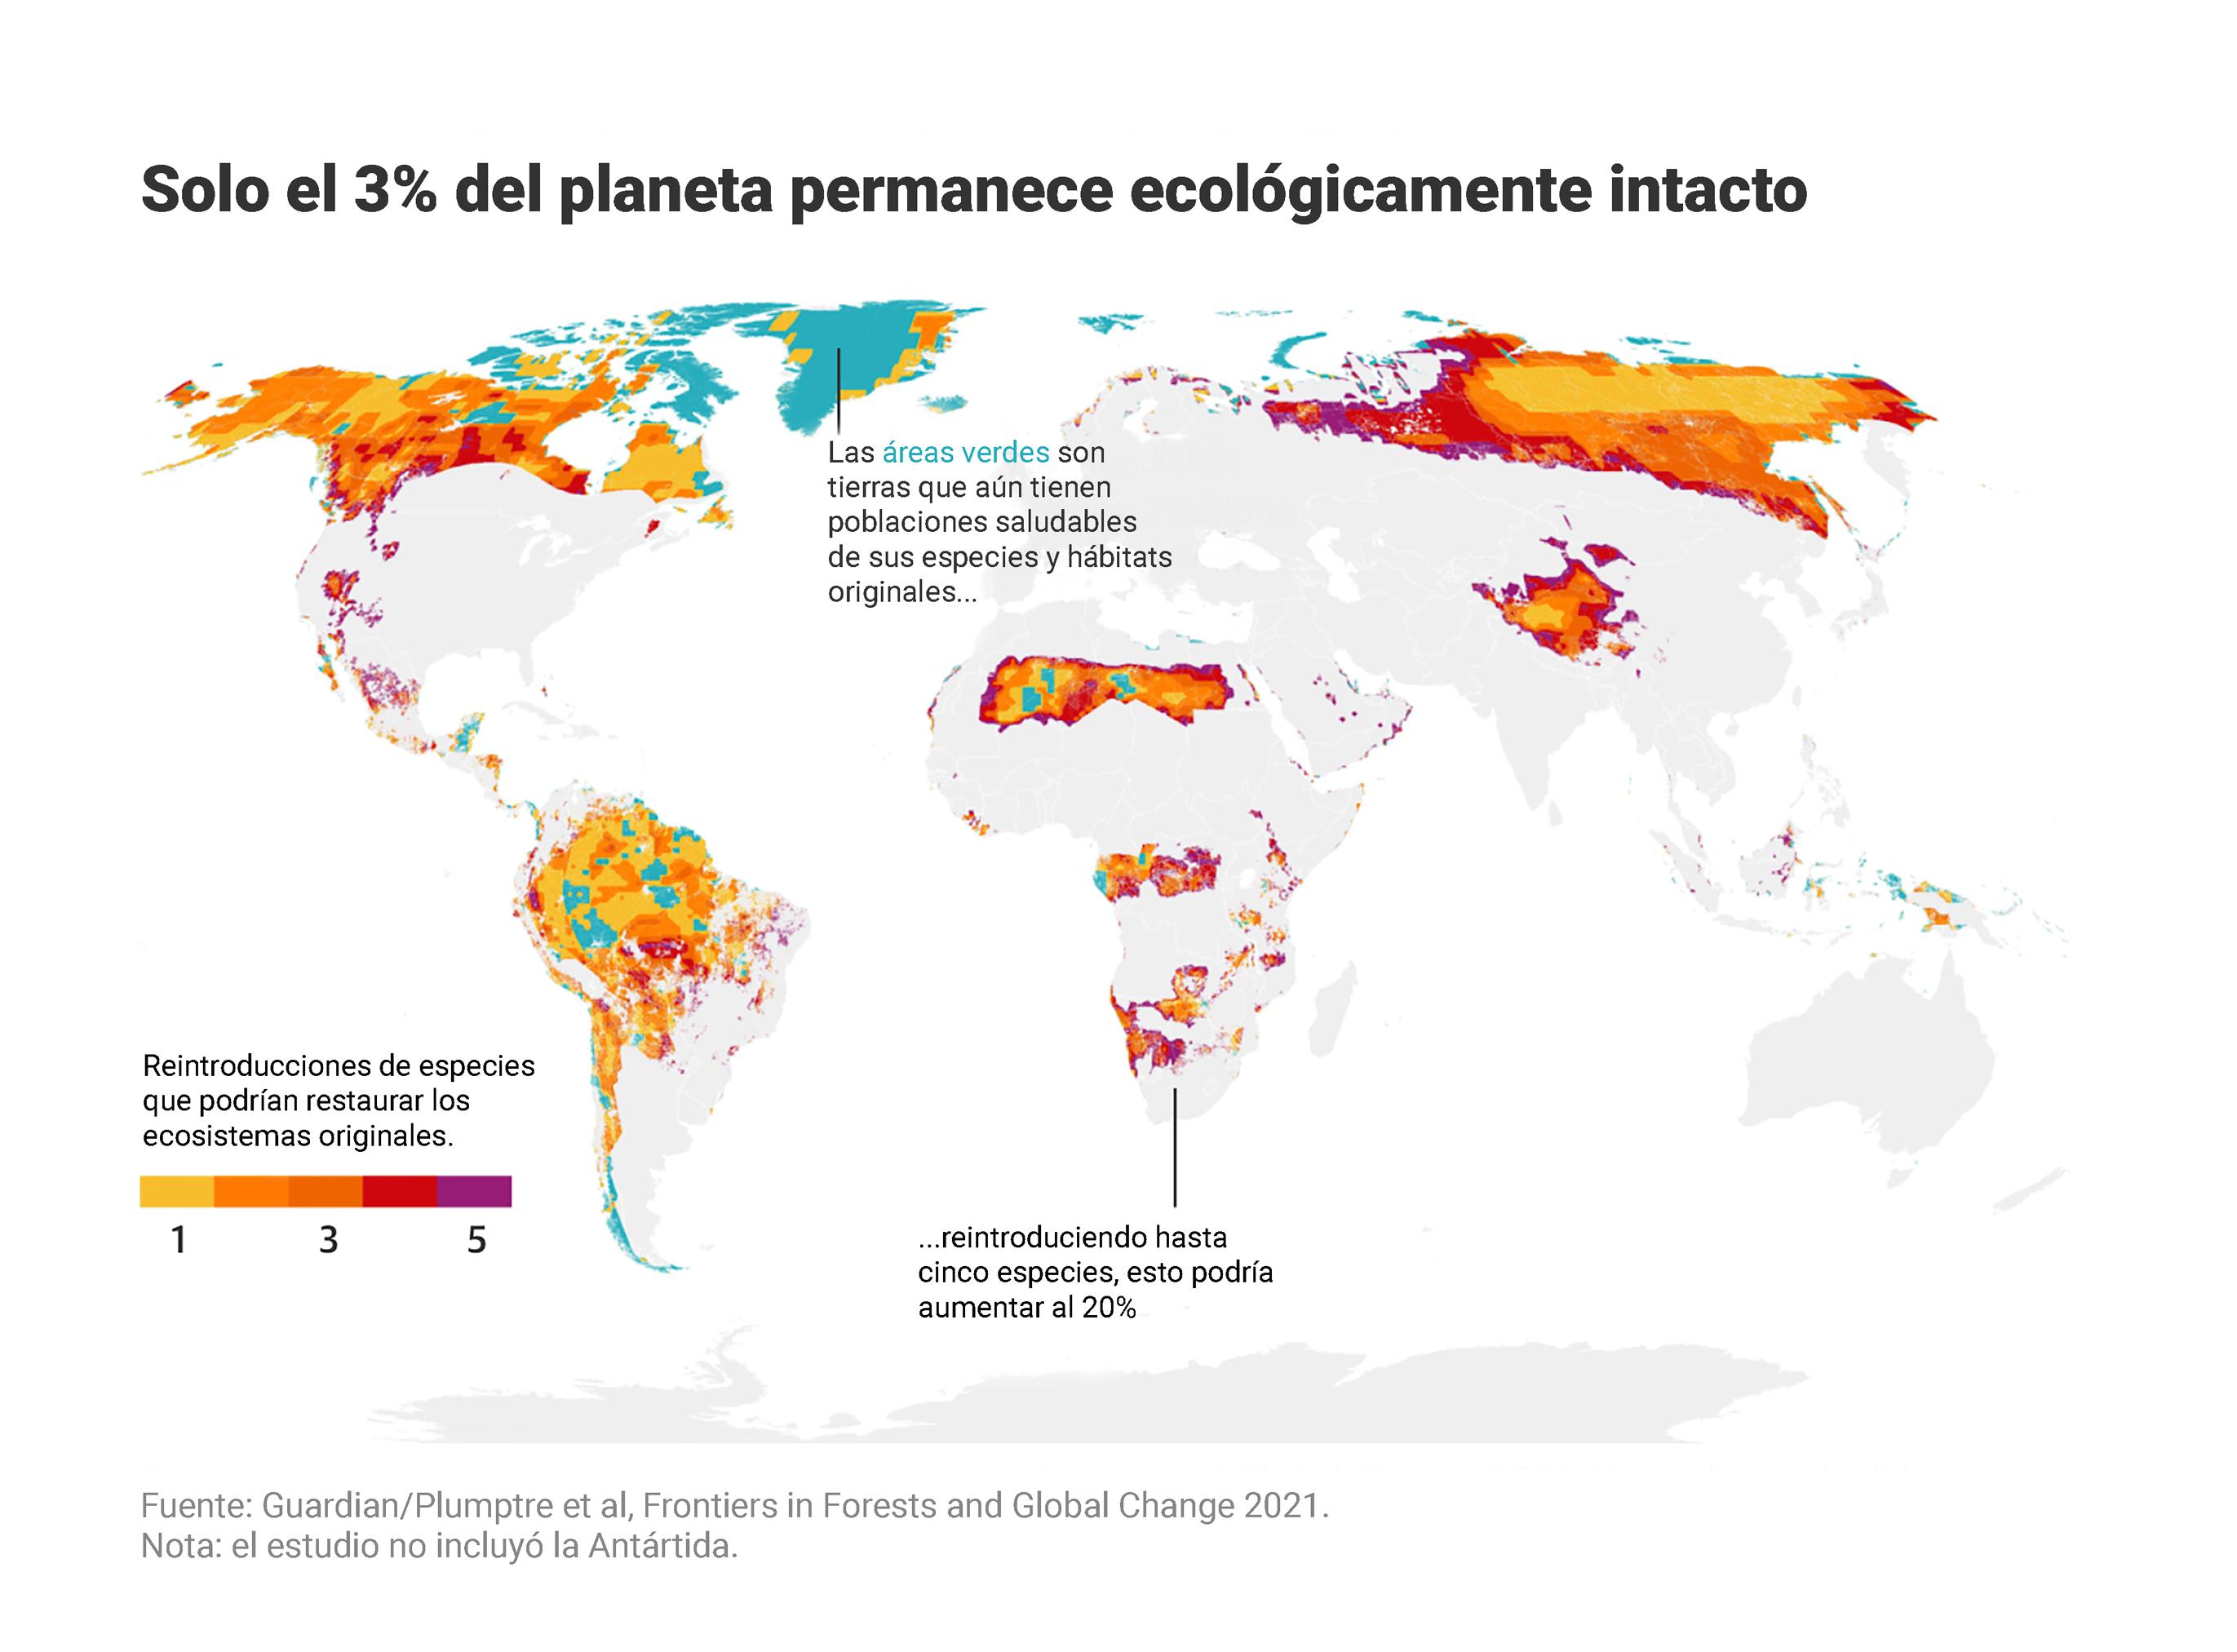 Biodiversidad intacta vs manipulada - Fuente Guardian